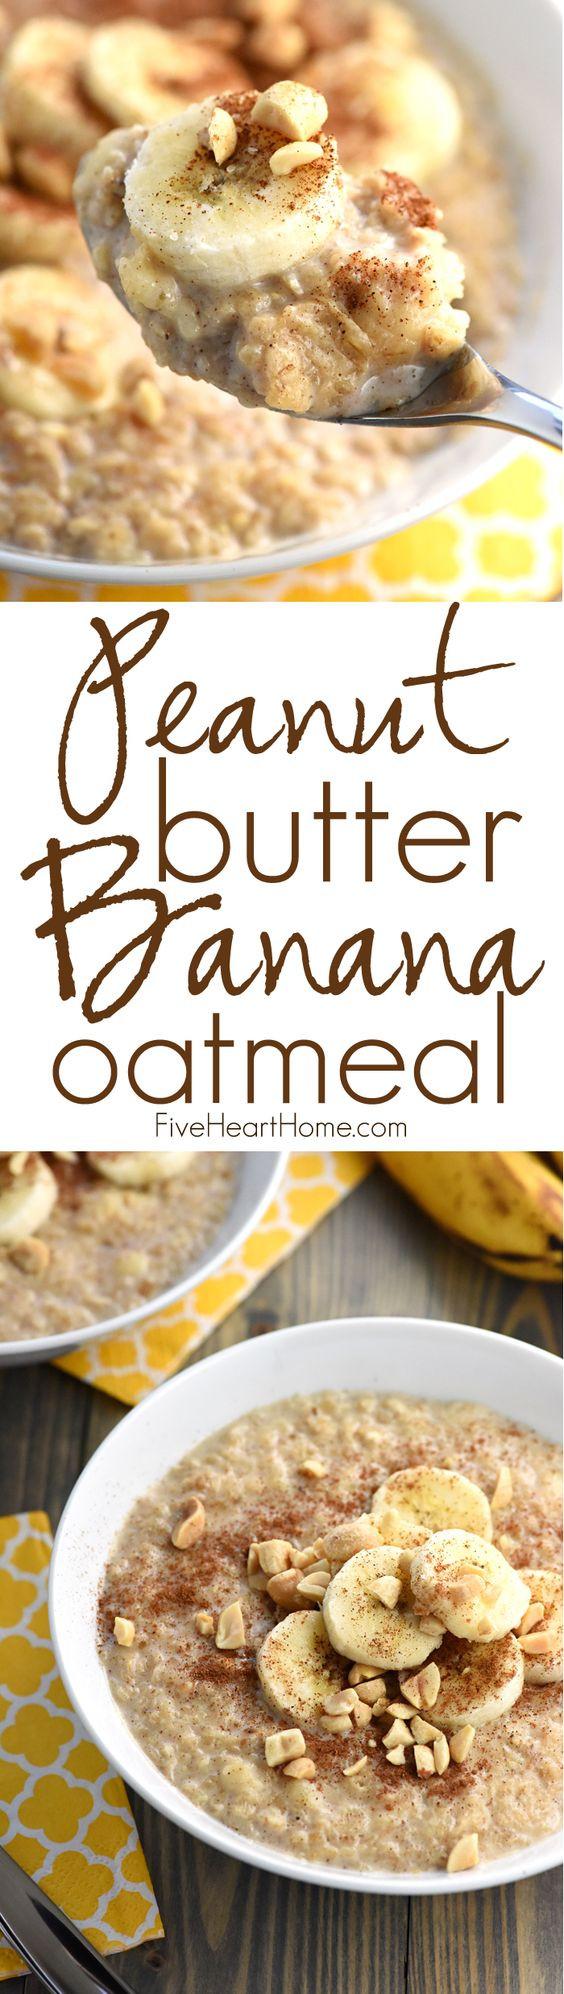 https://www.fivehearthome.com/quick-peanut-butter-banana-oatmeal/